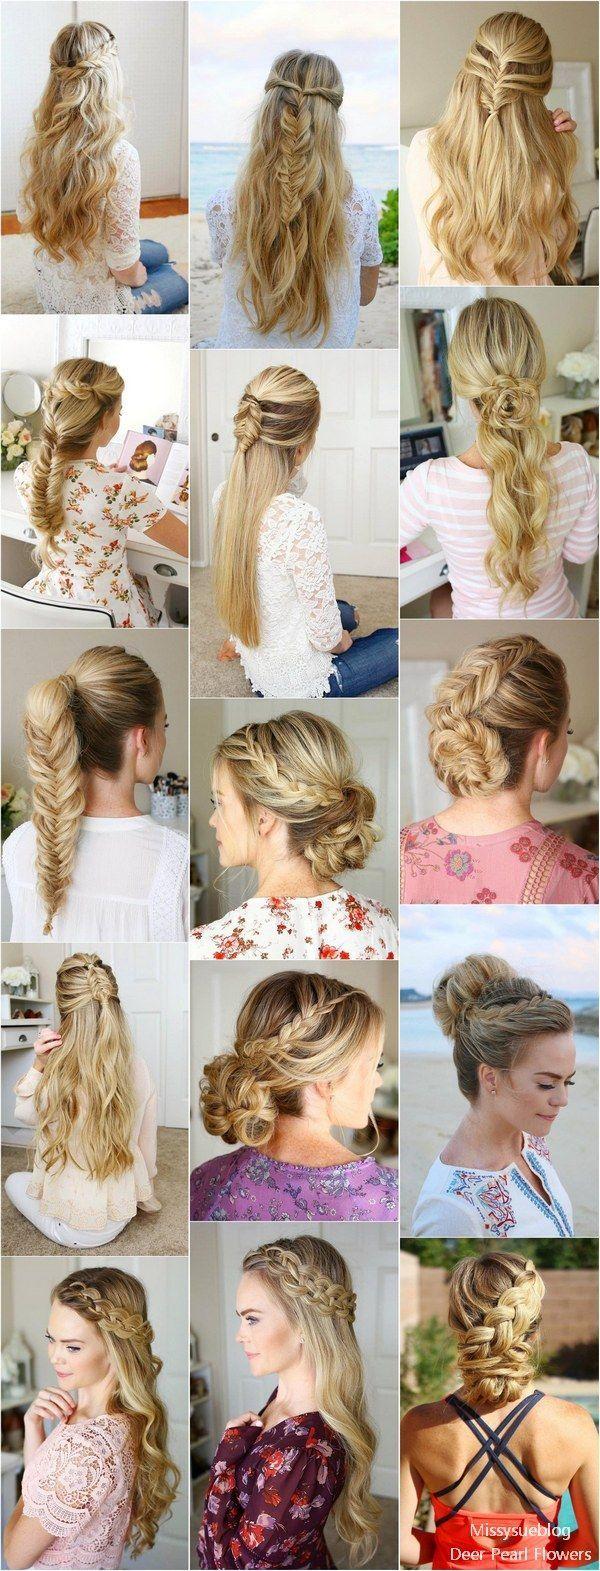 Long Wedding & Prom Hairstyles from Missysueblog ( http://missysue.com )  #wedding #weddingideas #fashion / http://www.deerpearlflowers.com/wedding-prom-hairstyles-for-long-hair/ #weddinghairstyles